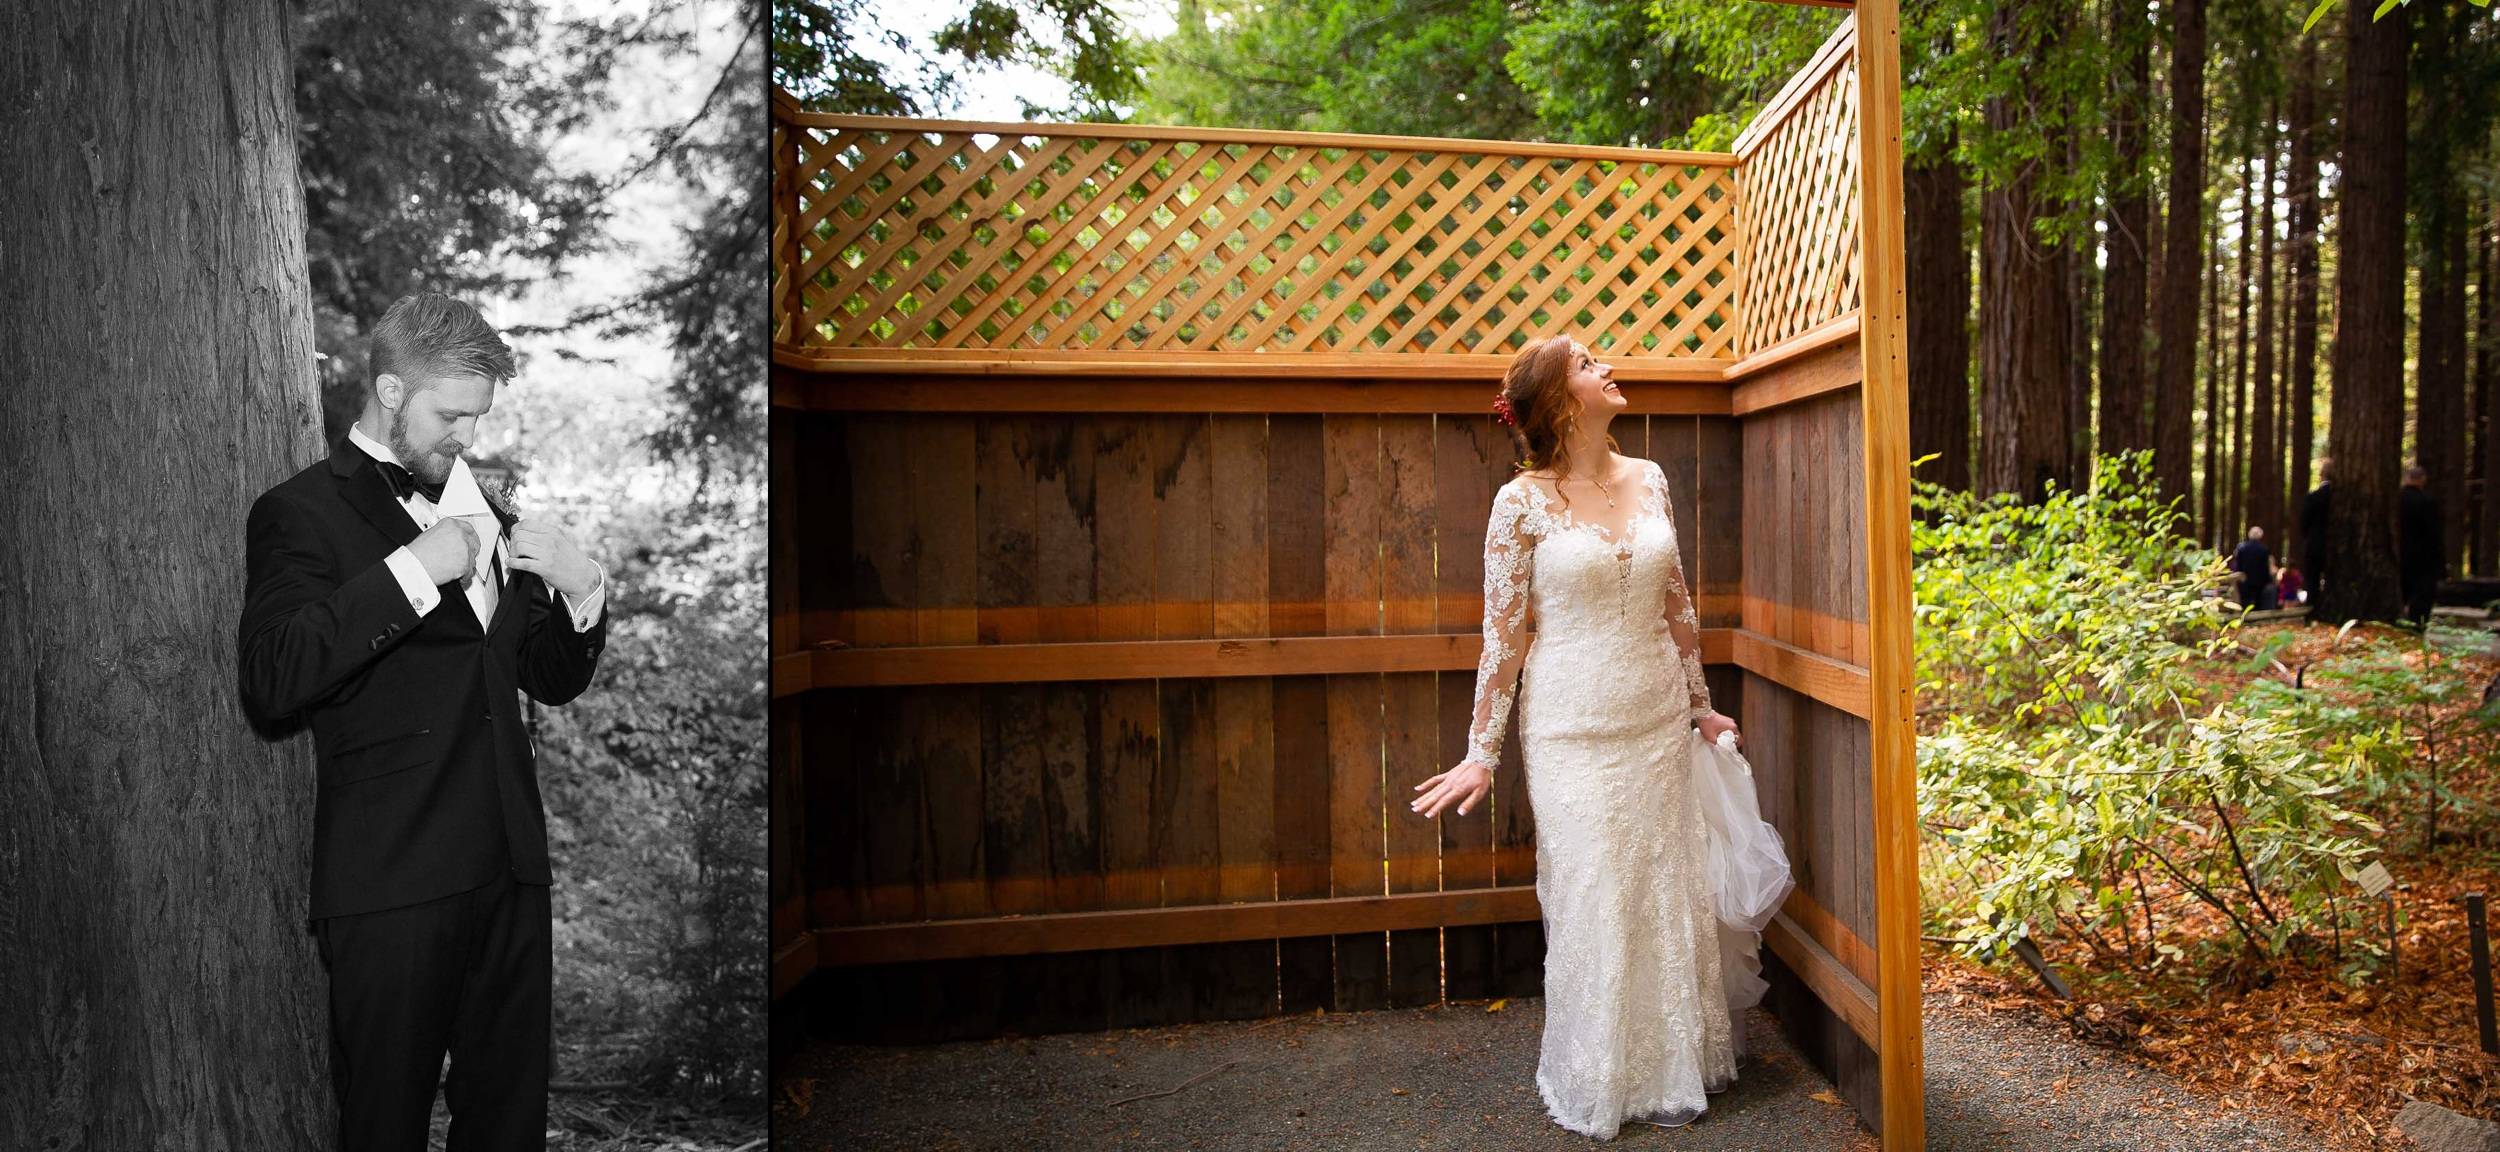 Berkeley Botanical Garden Wedding Ceremony in the Redwood Grove Ceremony and SF Bay Wedding Cruise Reception-19.jpg